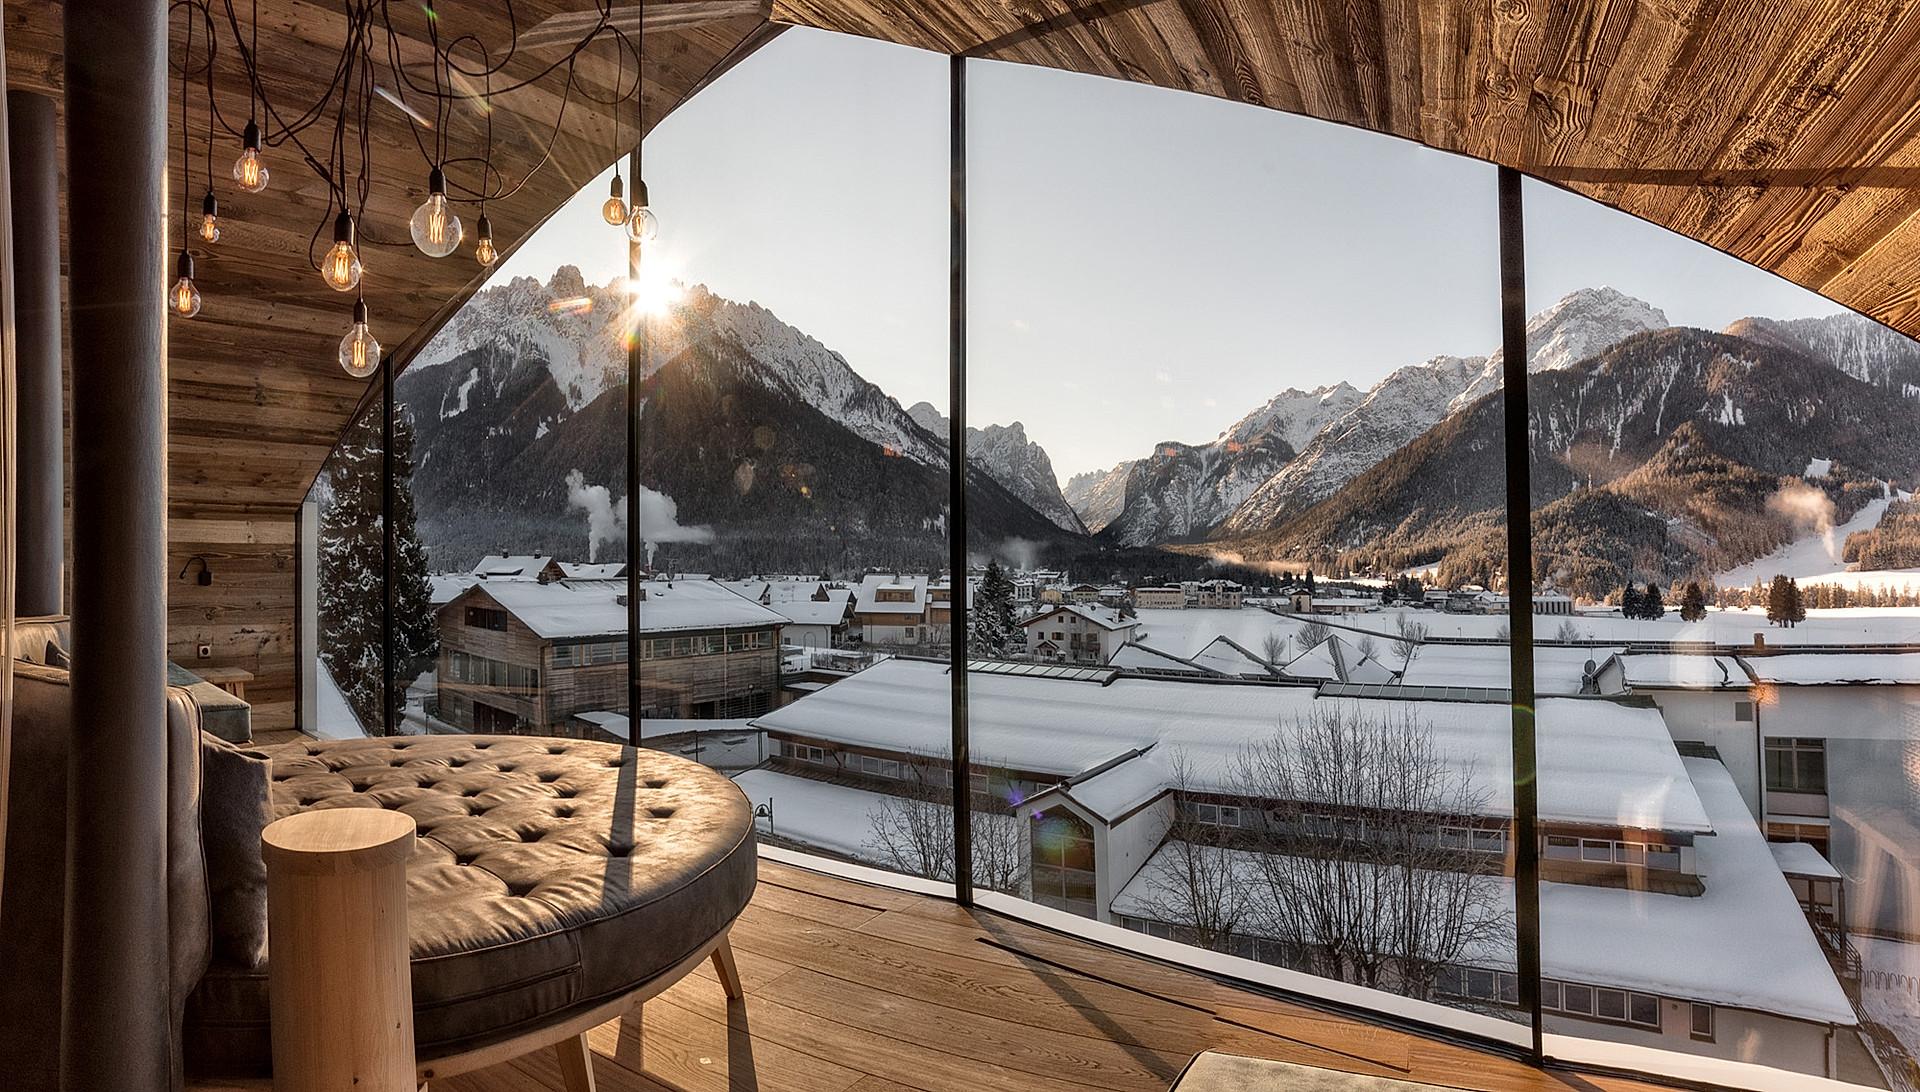 Hotelfotograf | Südtirol | Hotelfotografie | Tourismusfotograf | Wellnessfoto | Bayern | Tourismusfotografie | SPA Fotografie